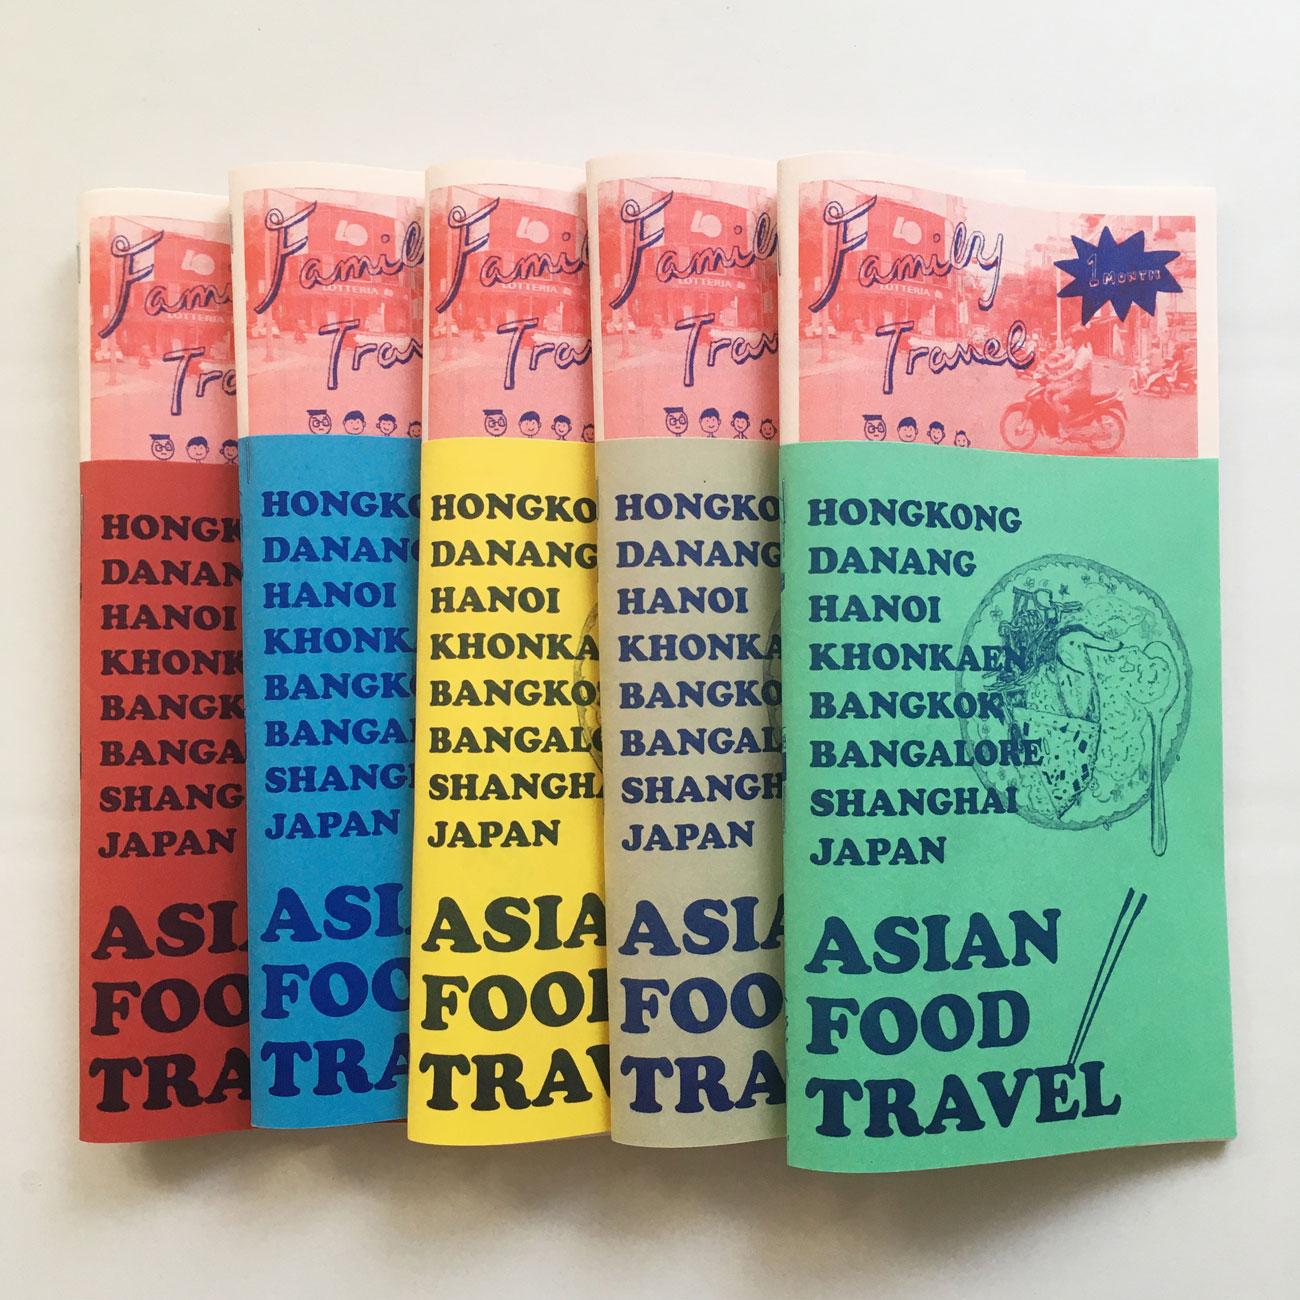 ASIAN_FOOD_DESIGN magazines.